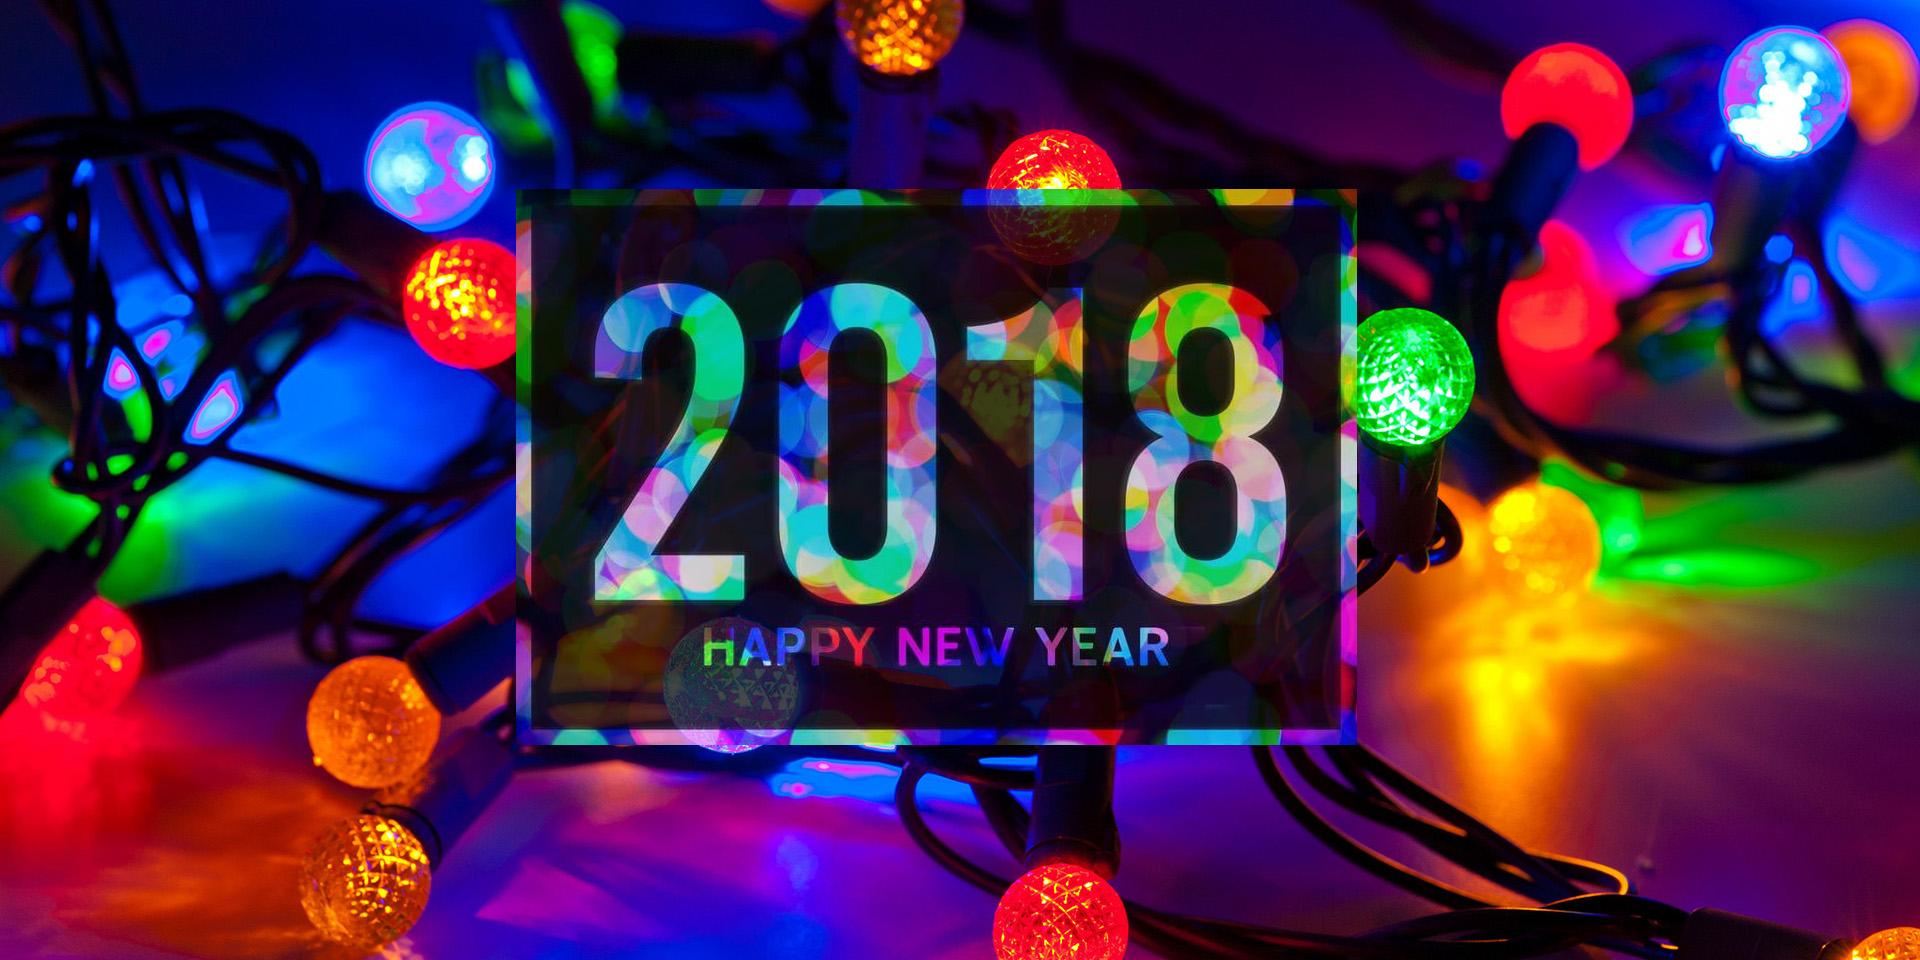 mmozg.net: Новогодняя гирлянда 2018